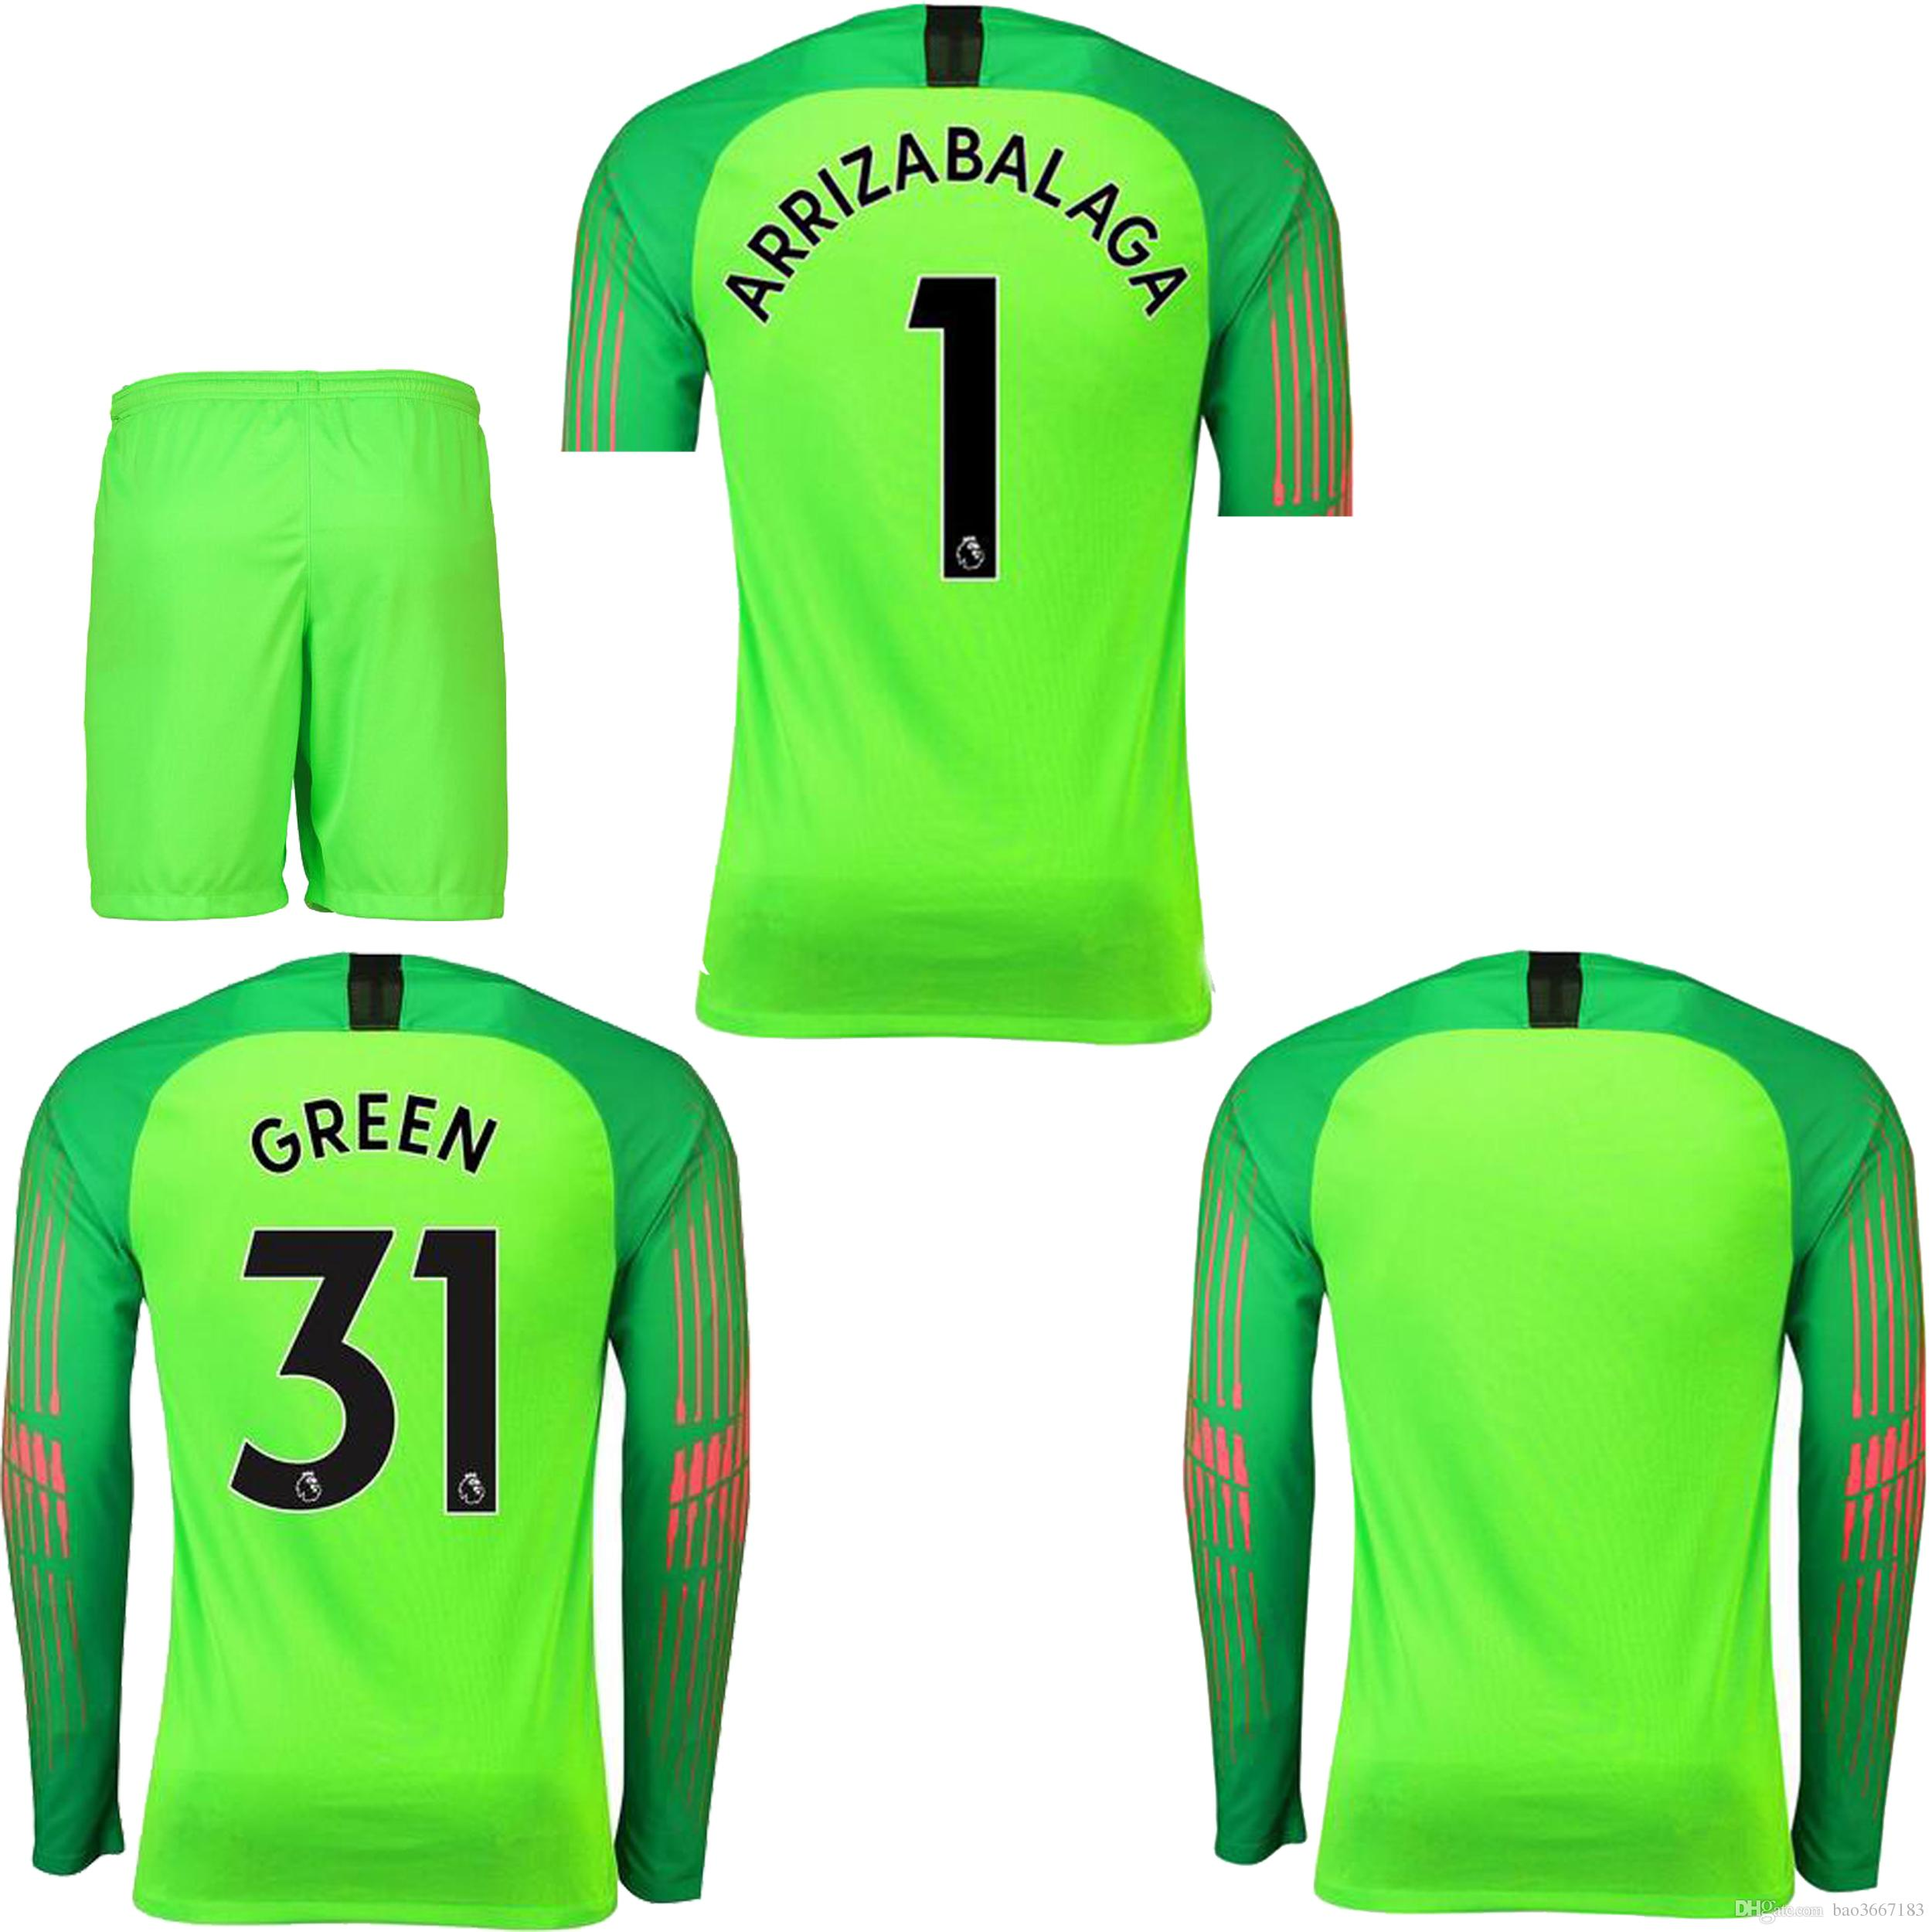 Compre AAA Calidad Tailandesa 2018 2019 Camiseta De Portero De Manga Larga  2018 ARRIZABALAGA VERDE Camiseta Del Estadio De Portero 2018 19 A  18.52  Del ... 3eaabc4e48dd7